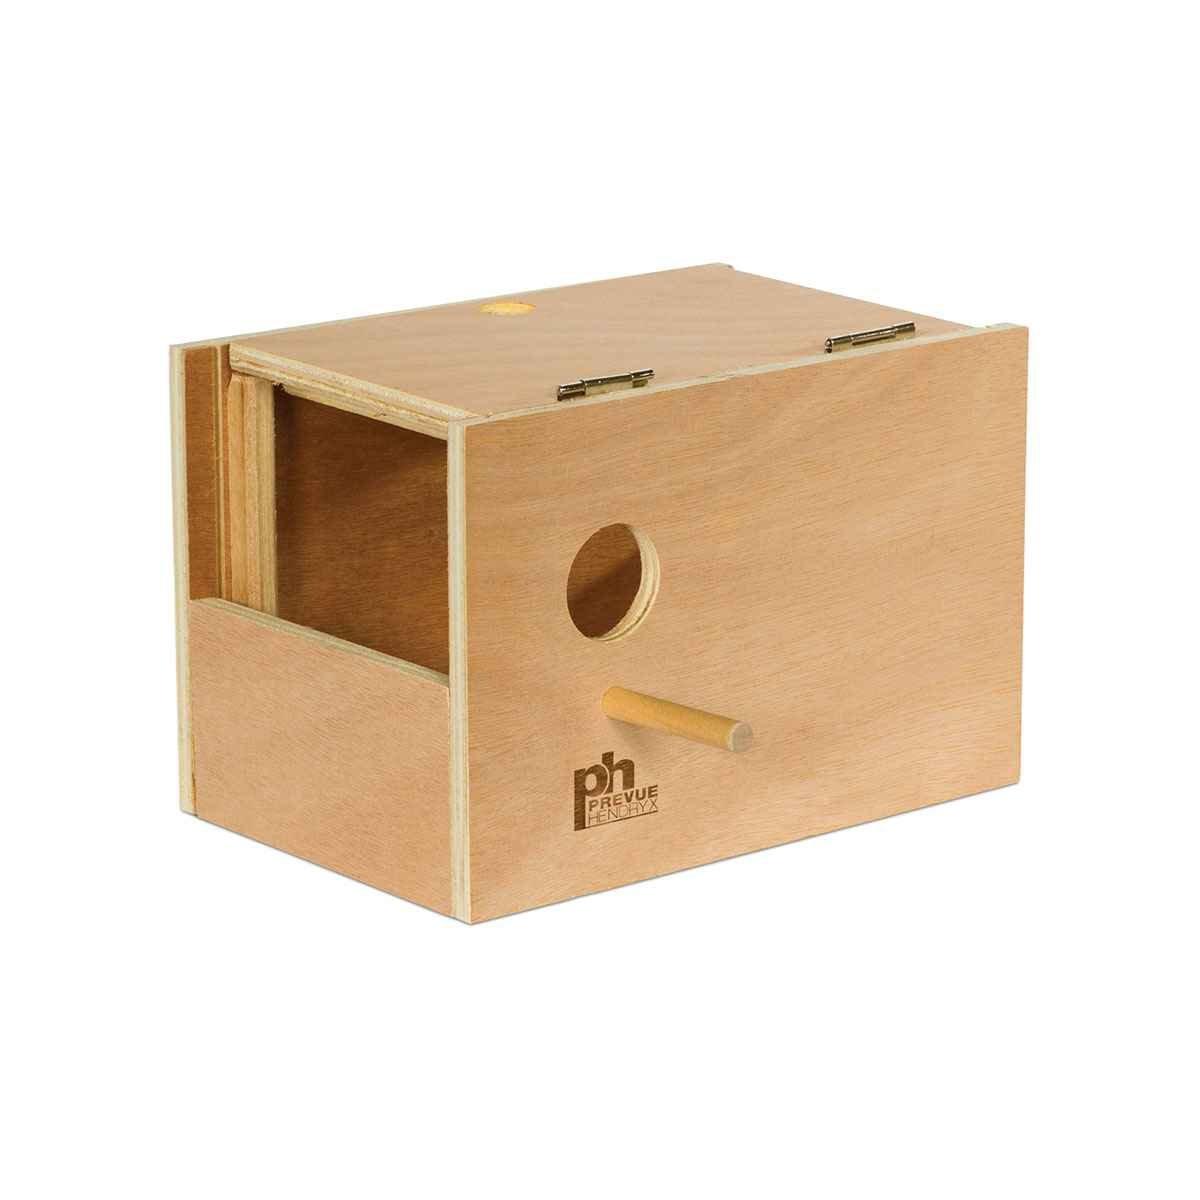 Prevue-Hendryx Parakeet Nest Box Outside Mount (Medium, 8Inch L x 6Inch W x 6Inch H)